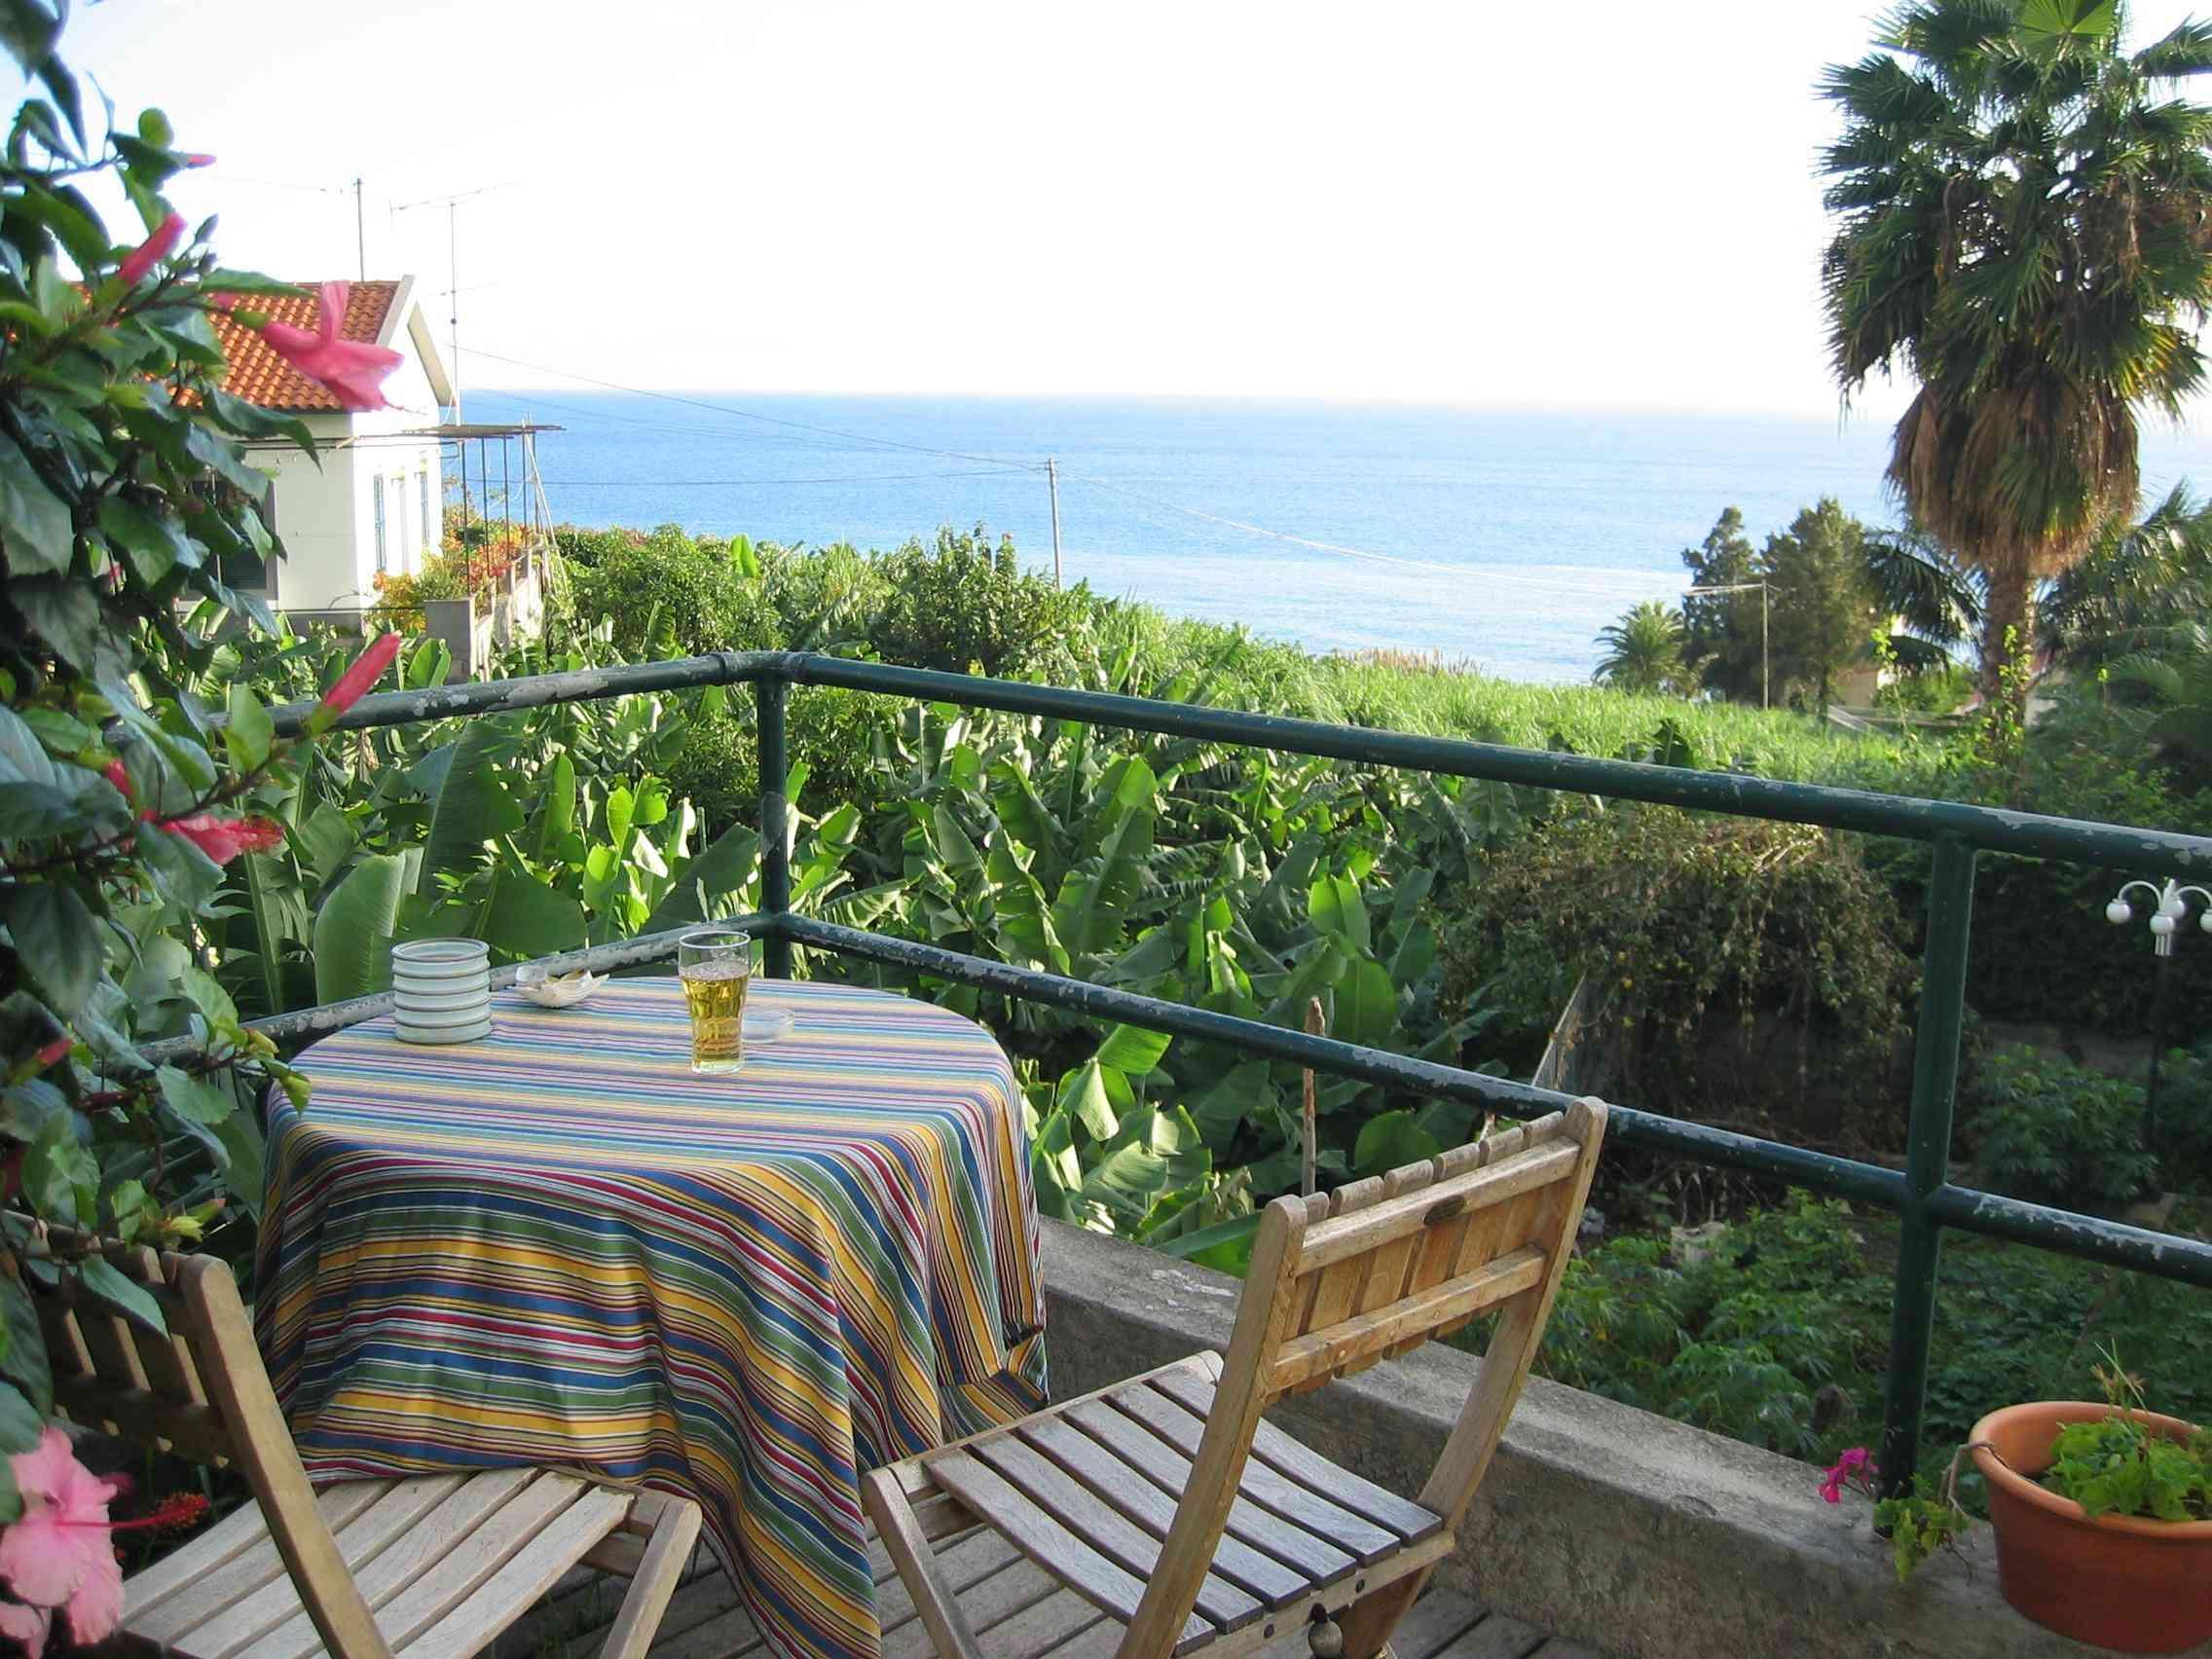 Ferienwohnung Privatunterkunft auf Madeira Funchal Cam de Lobos - Anbieter Gregòrio Ramos